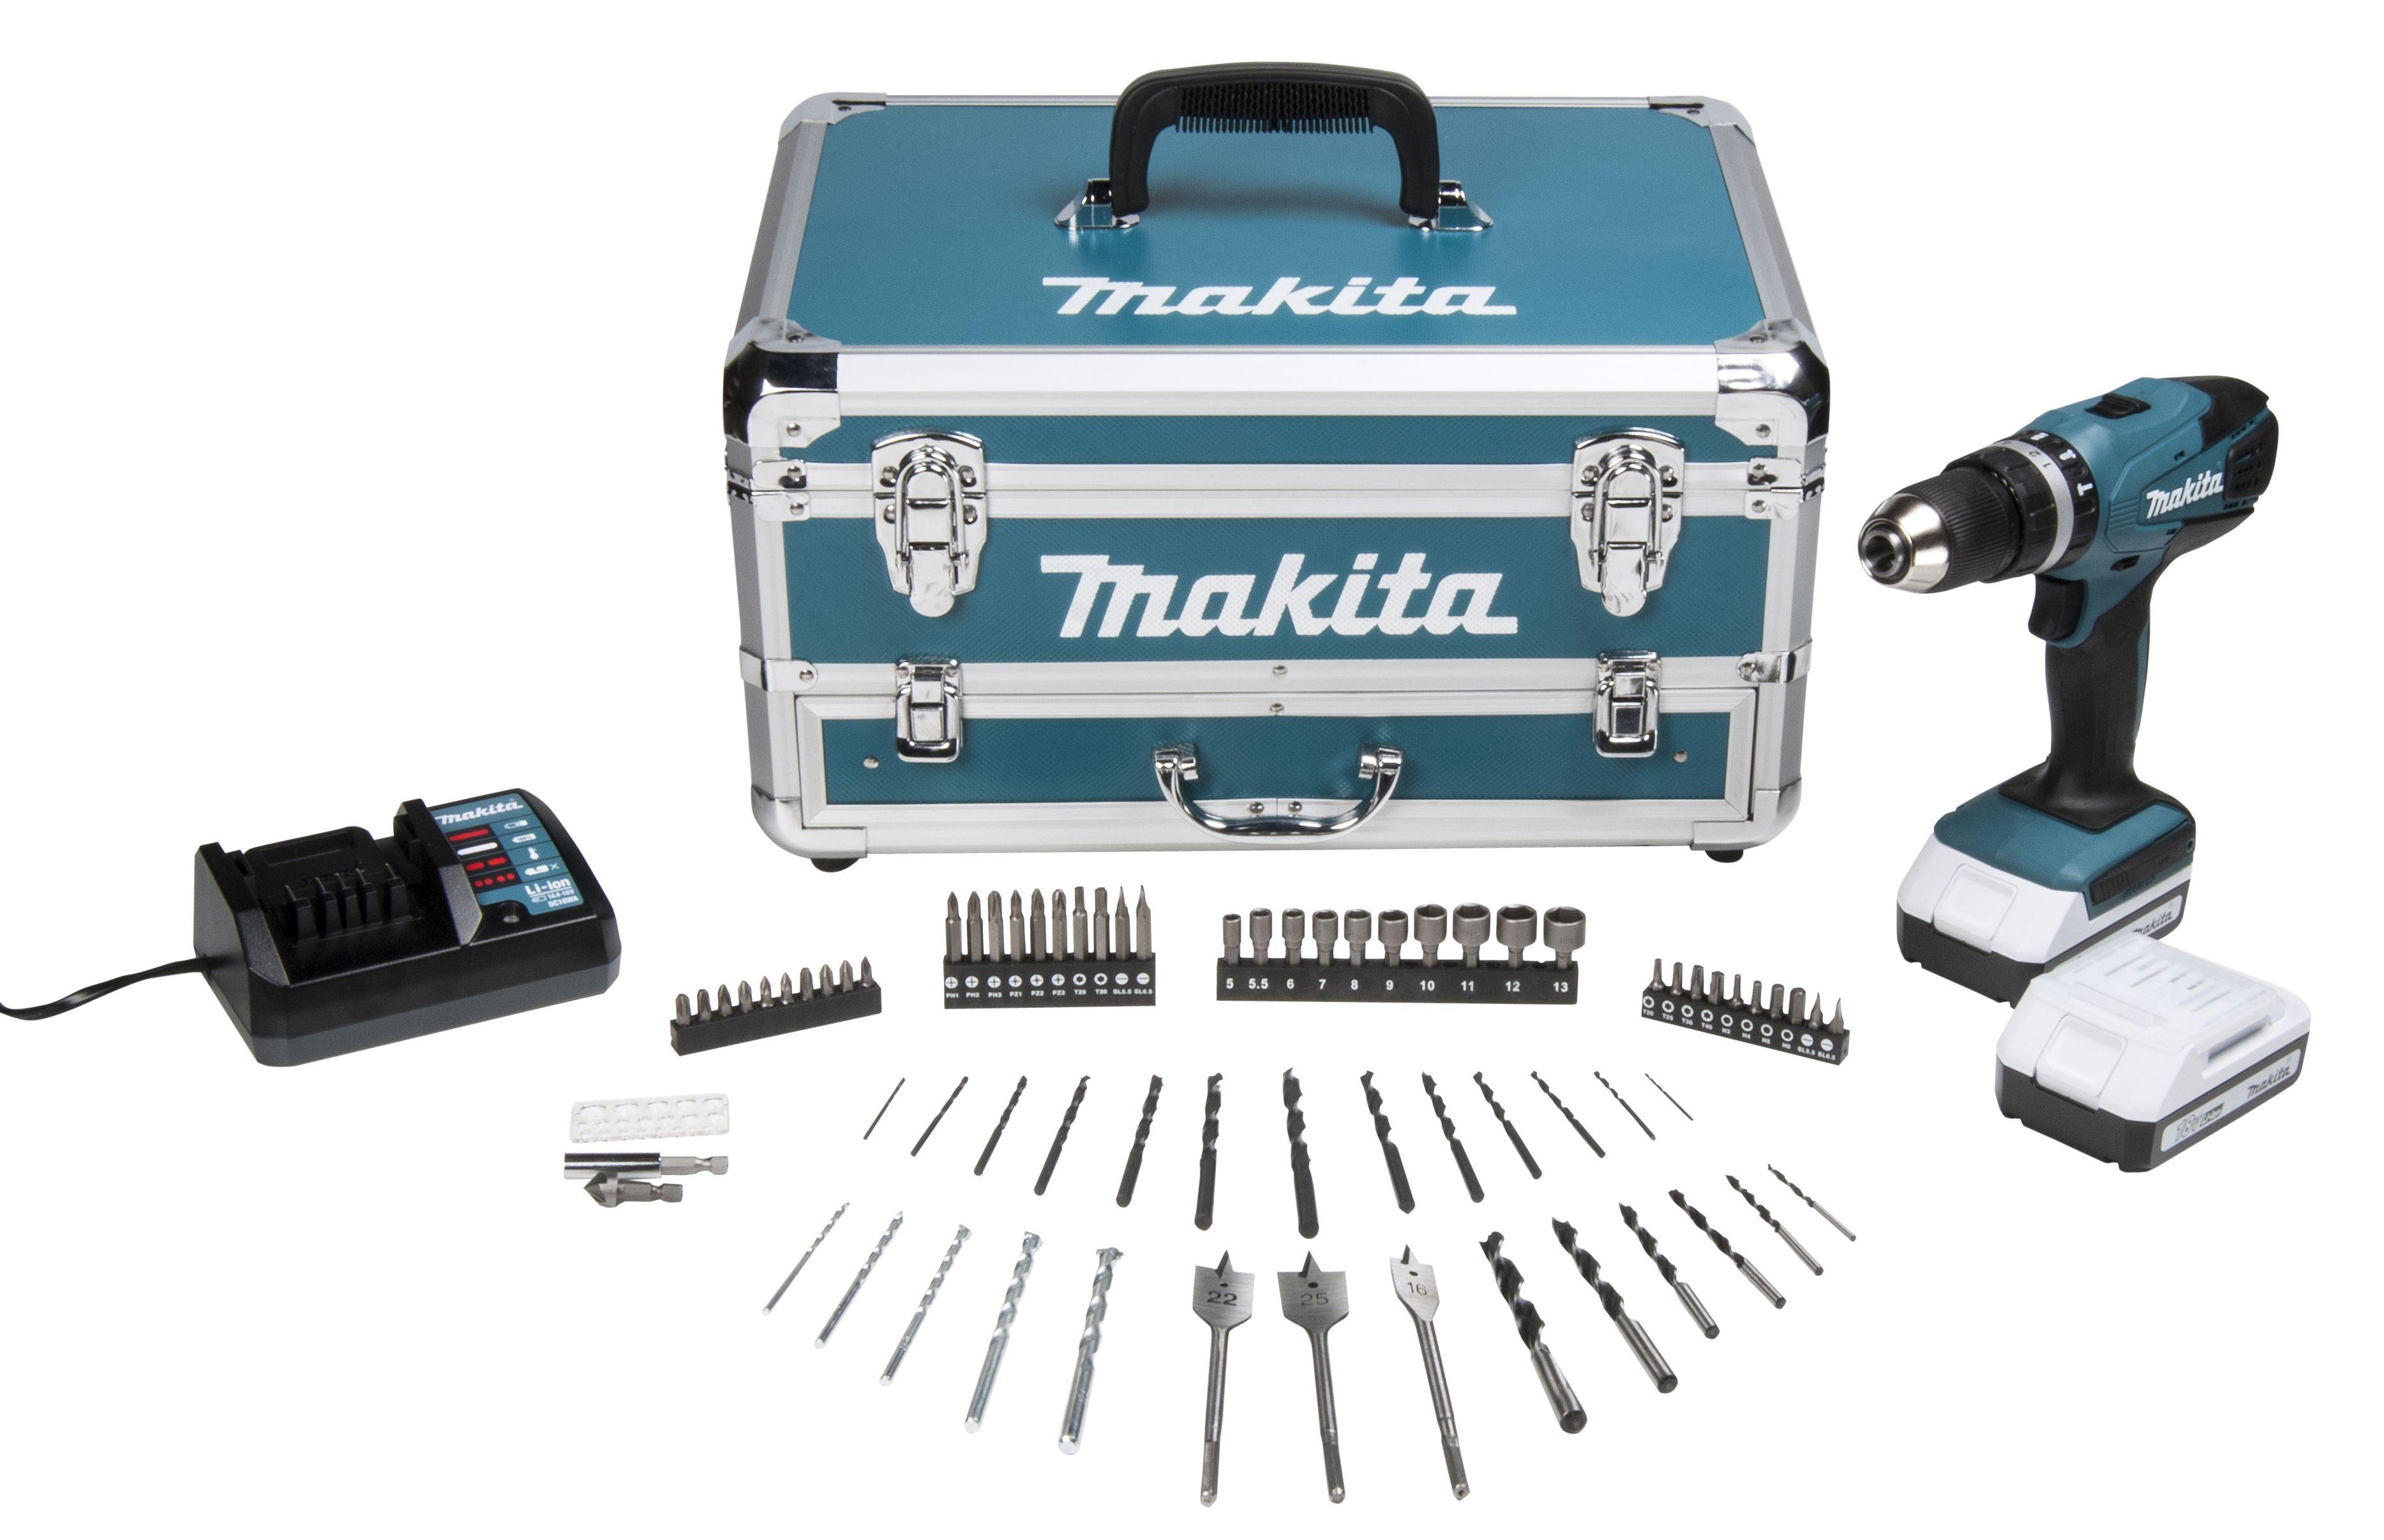 makita g series cordless 18v 1 3ah li ion combi drill. Black Bedroom Furniture Sets. Home Design Ideas